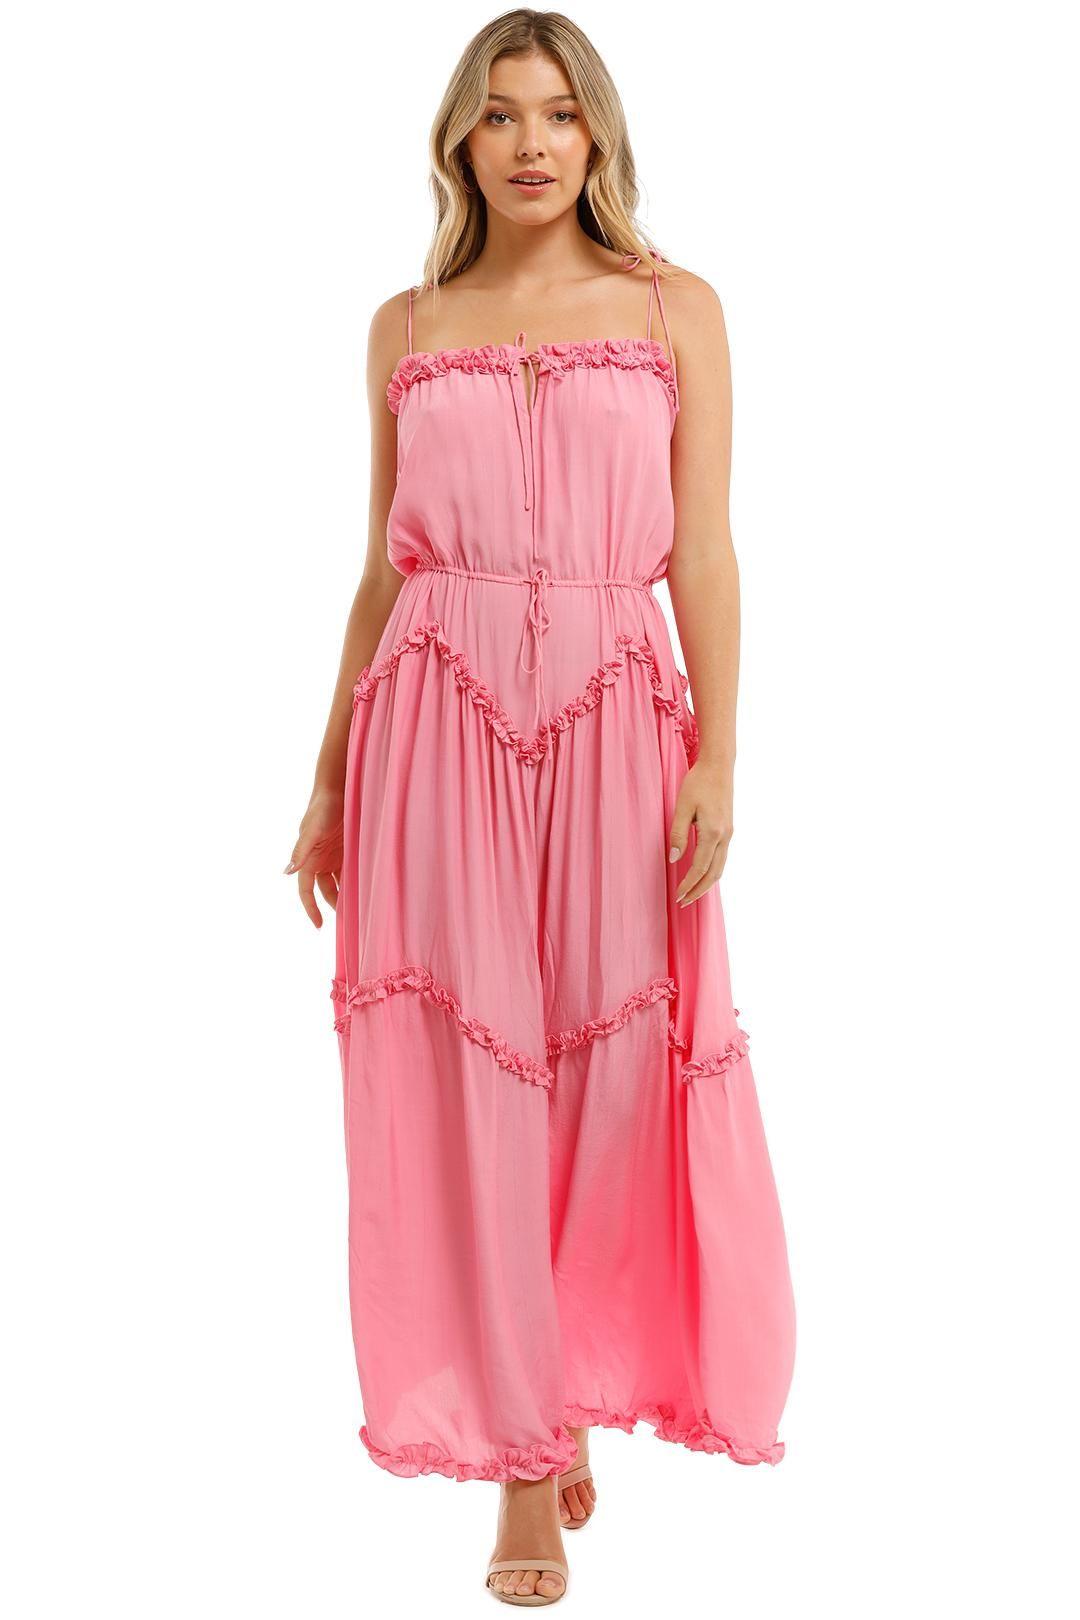 SWF Dynamic Dress Pink Maxi